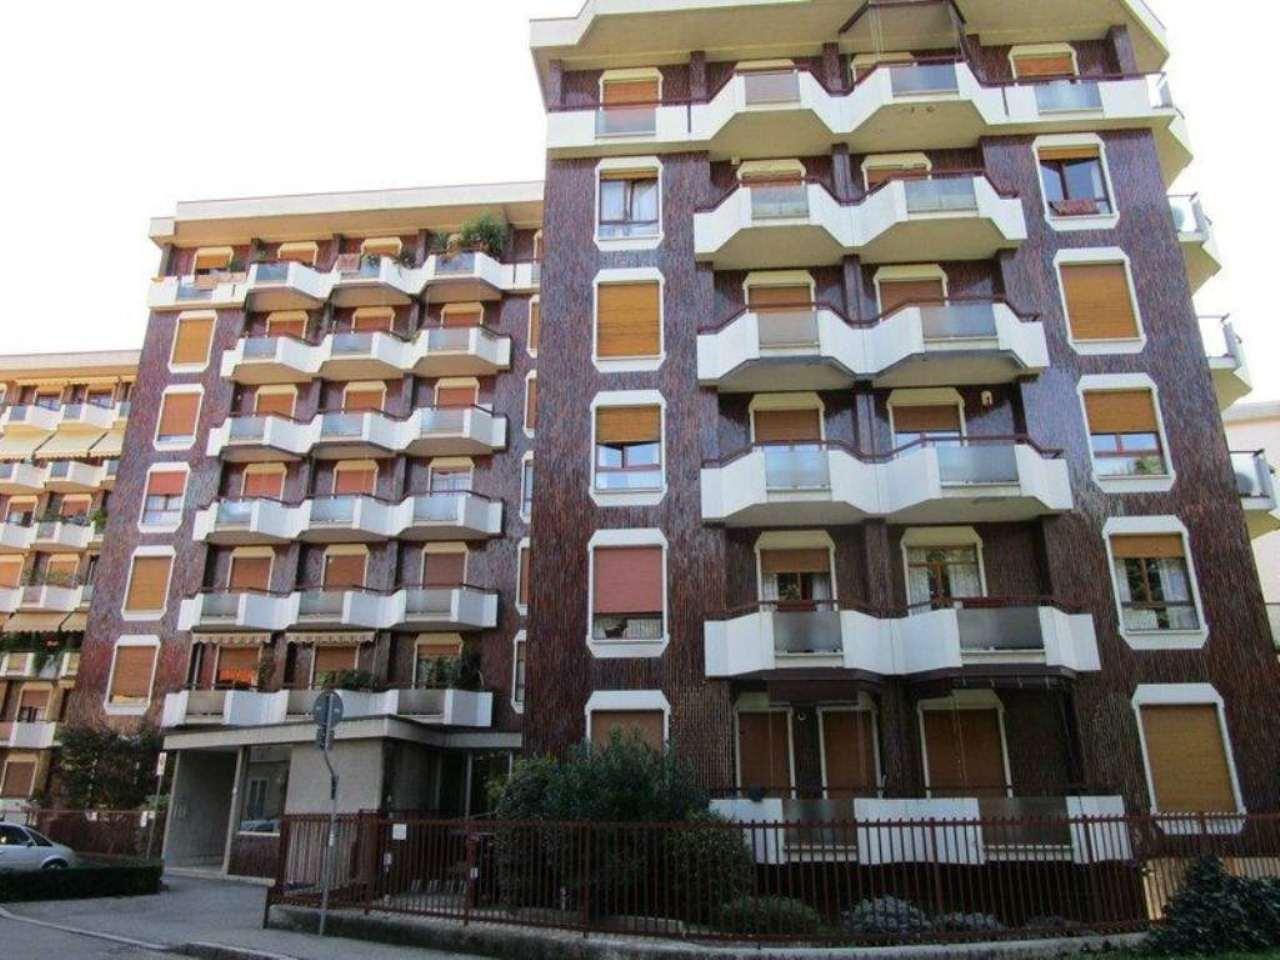 Bilocale Monza Via Oslavia 2